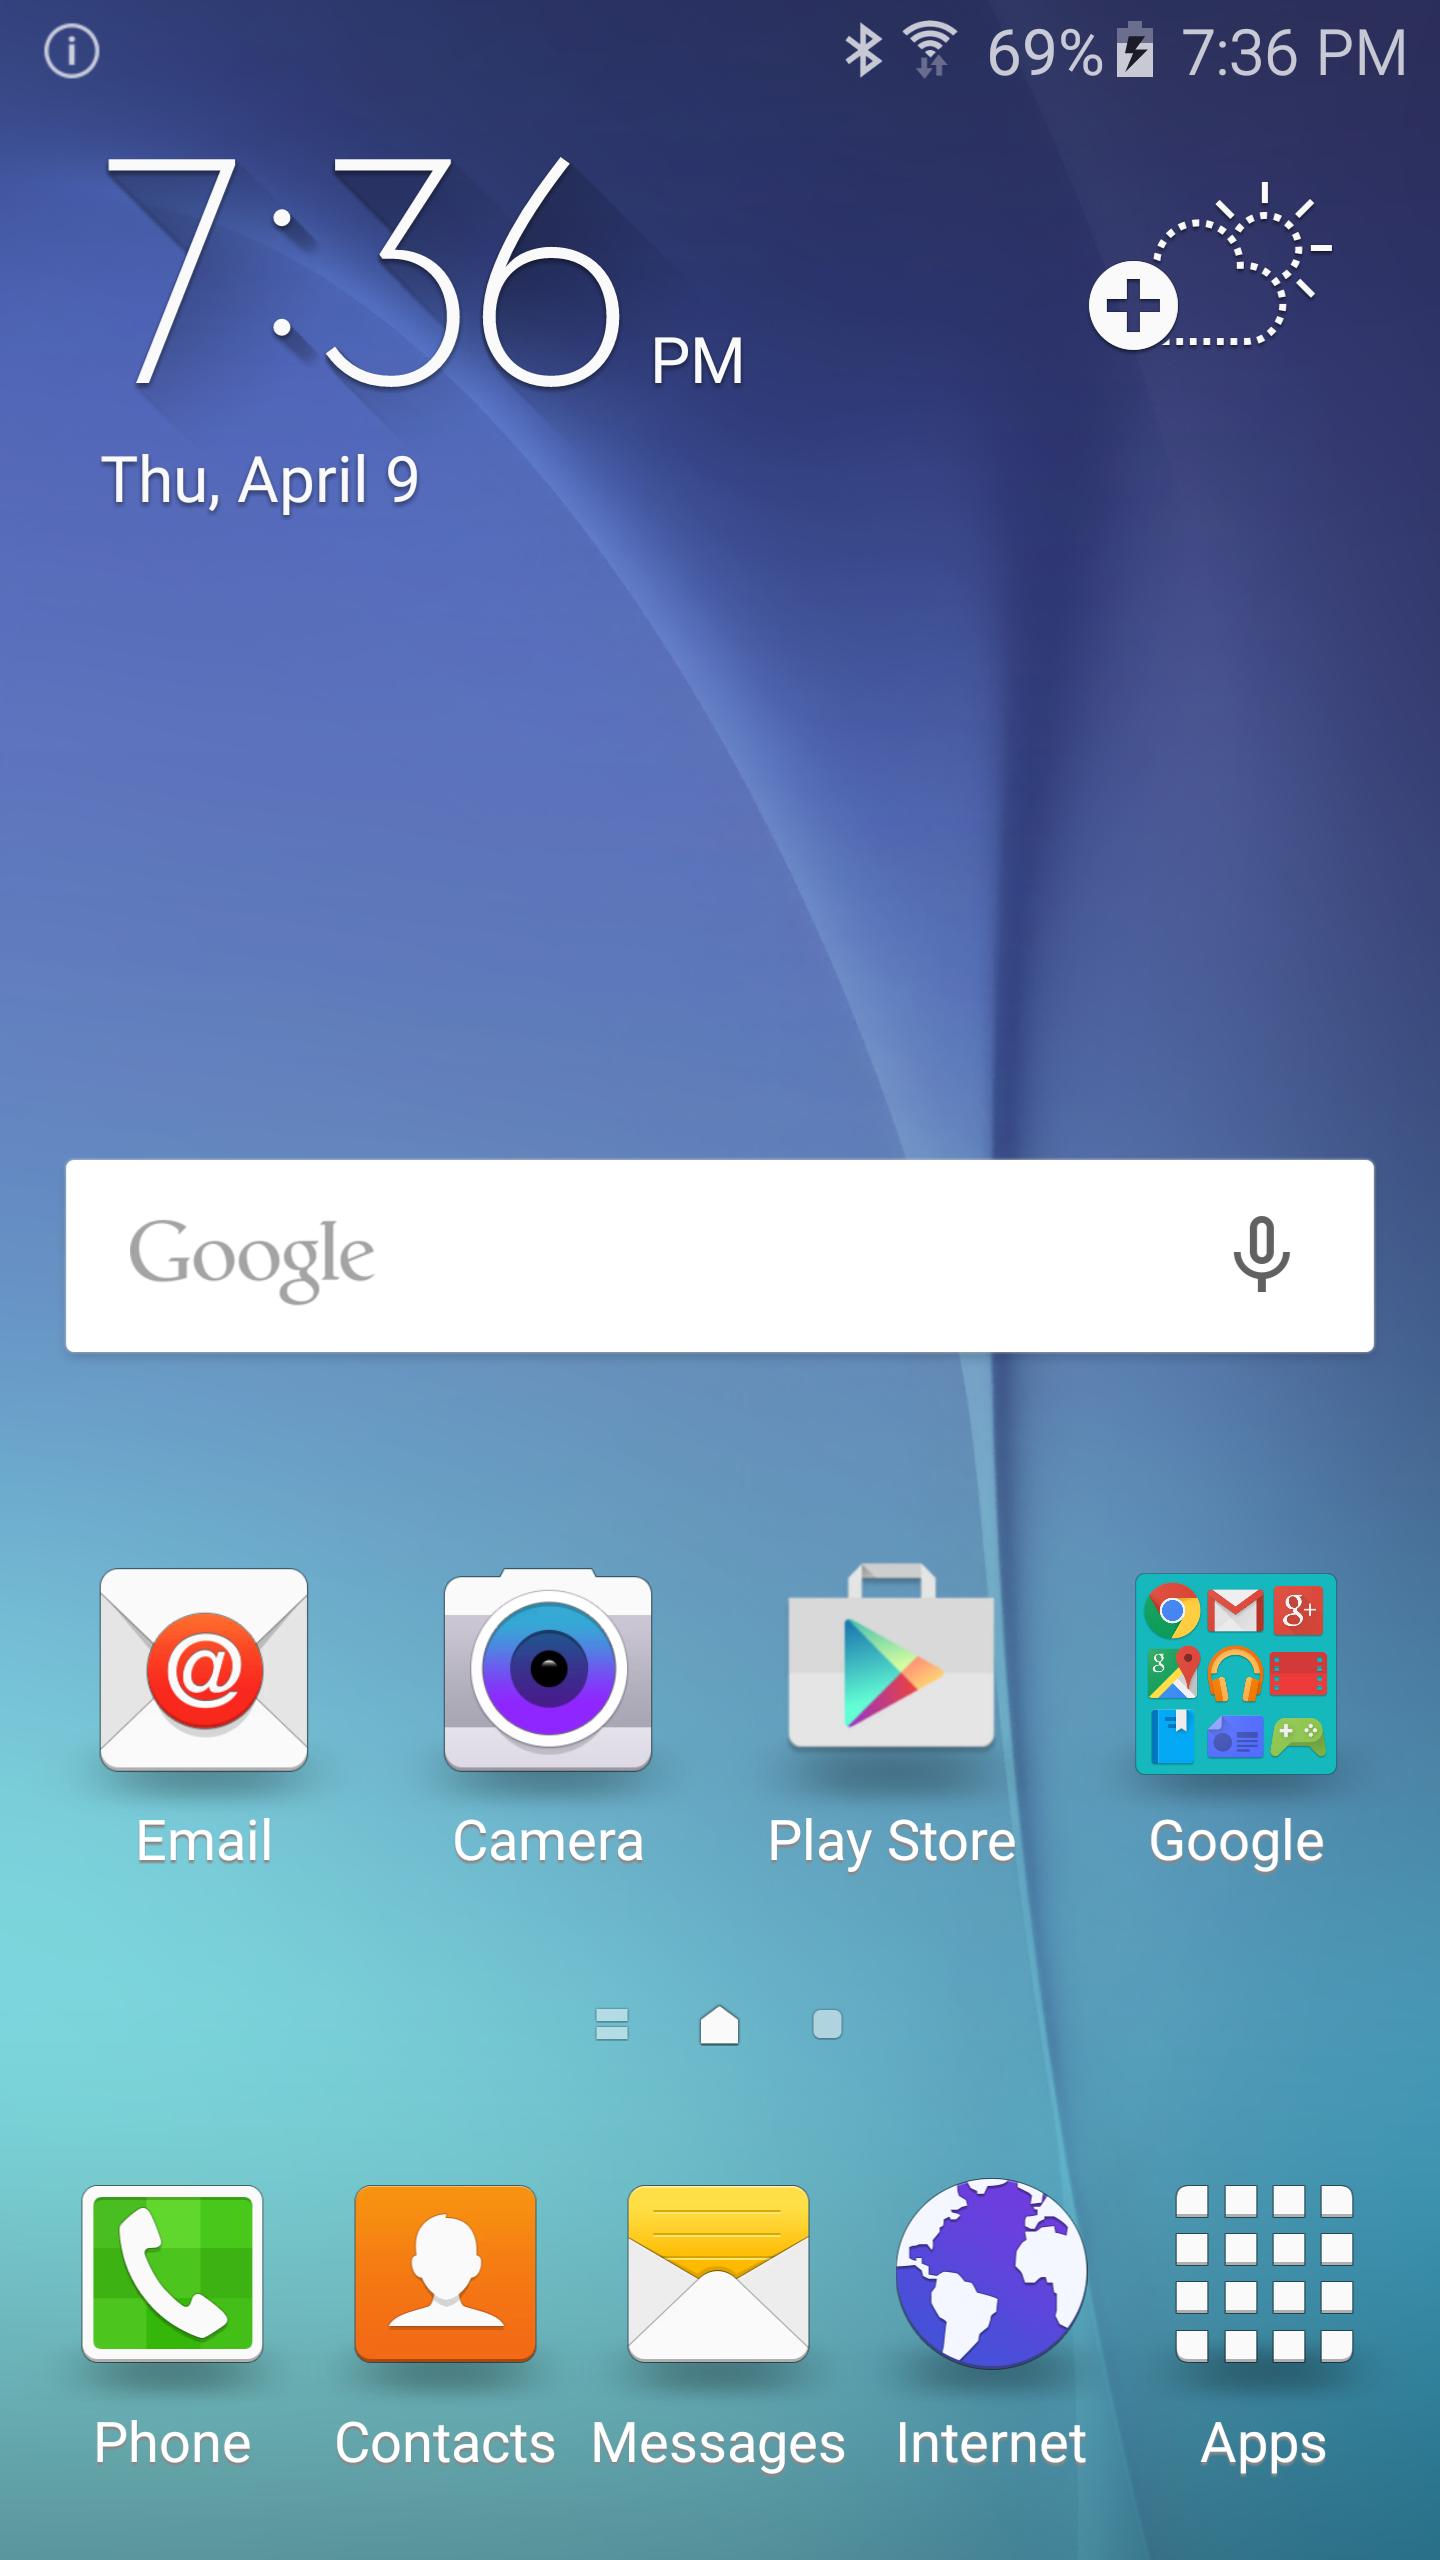 Samsung Galaxy S6 home screen screenshot   Smartphone Screeshots ...